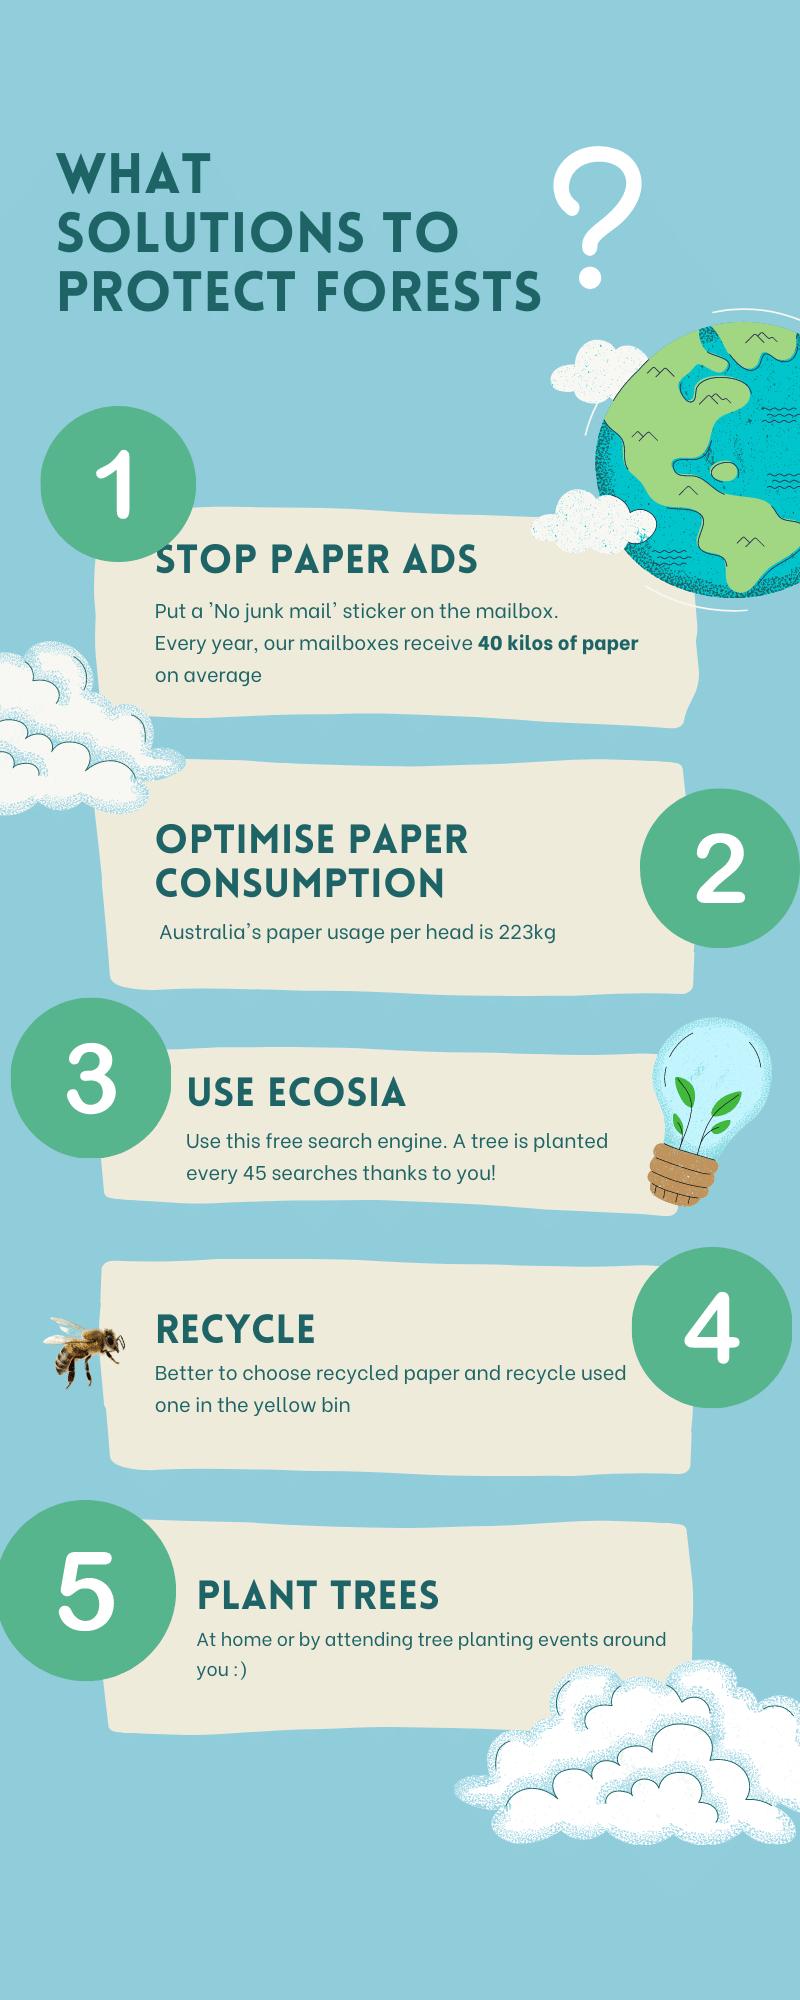 No-blah-blah-protect-forests-impact-web-design